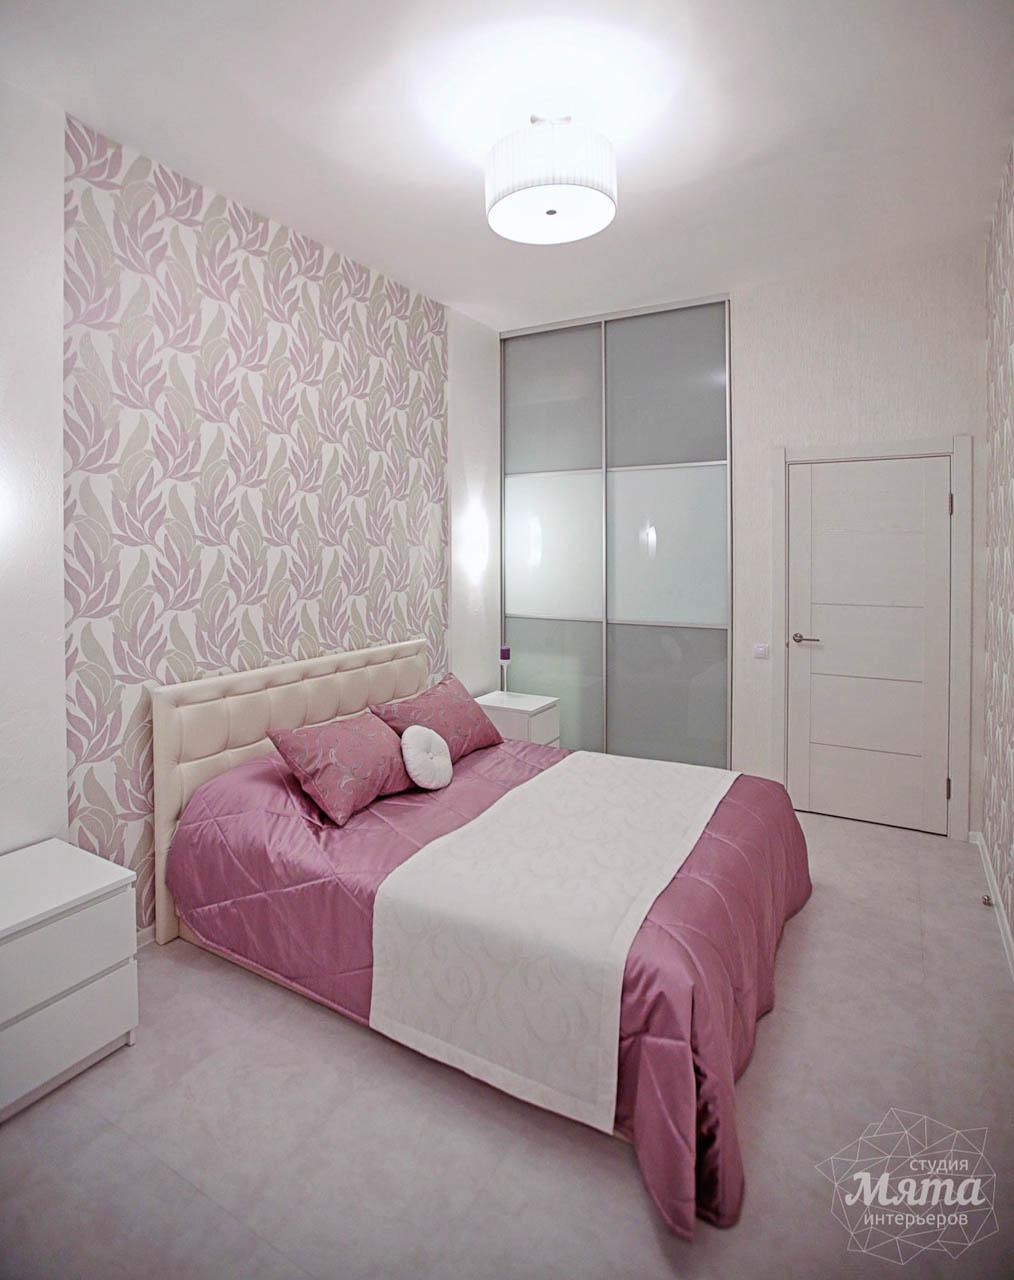 Дизайн интерьера и ремонт трехкомнатной квартиры по ул. Чкалова 124 19